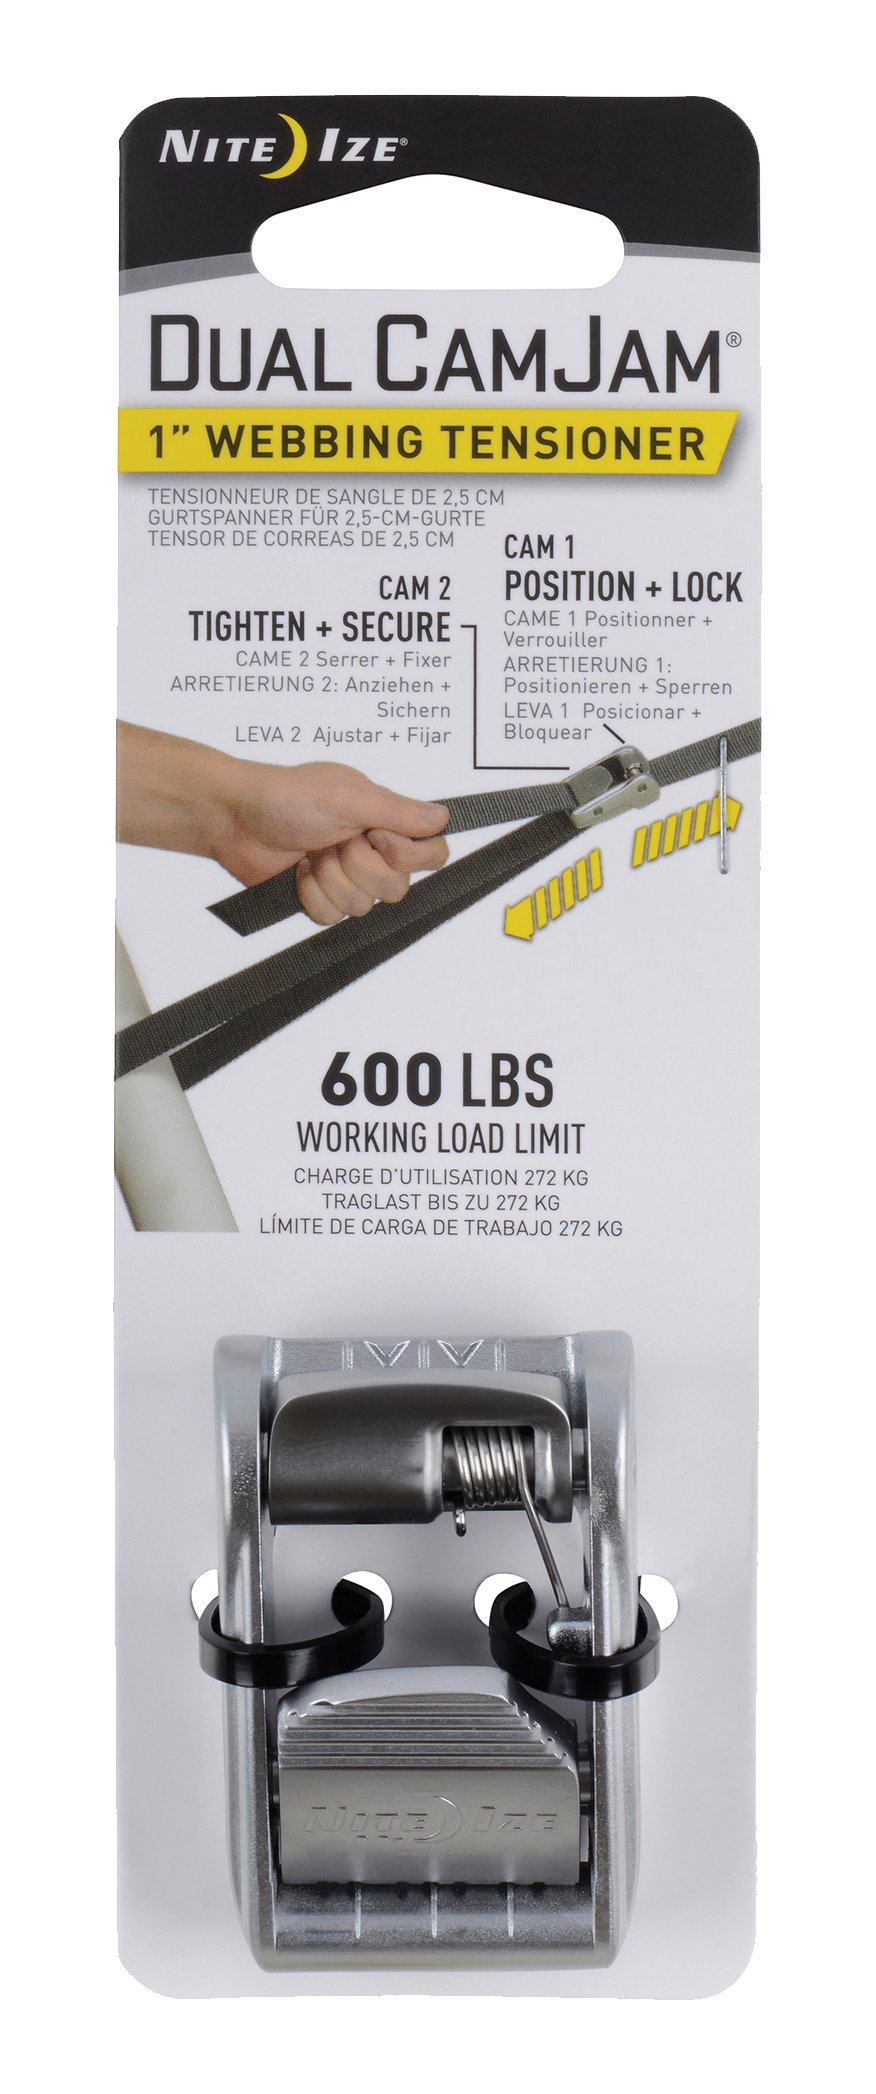 Nite Ize Dual Camjam Webbing Tensioner, Patented Dual Cam Zinc Alloy Buckle Fits Standard 1'' Webbing, 600 Lb Load Limit